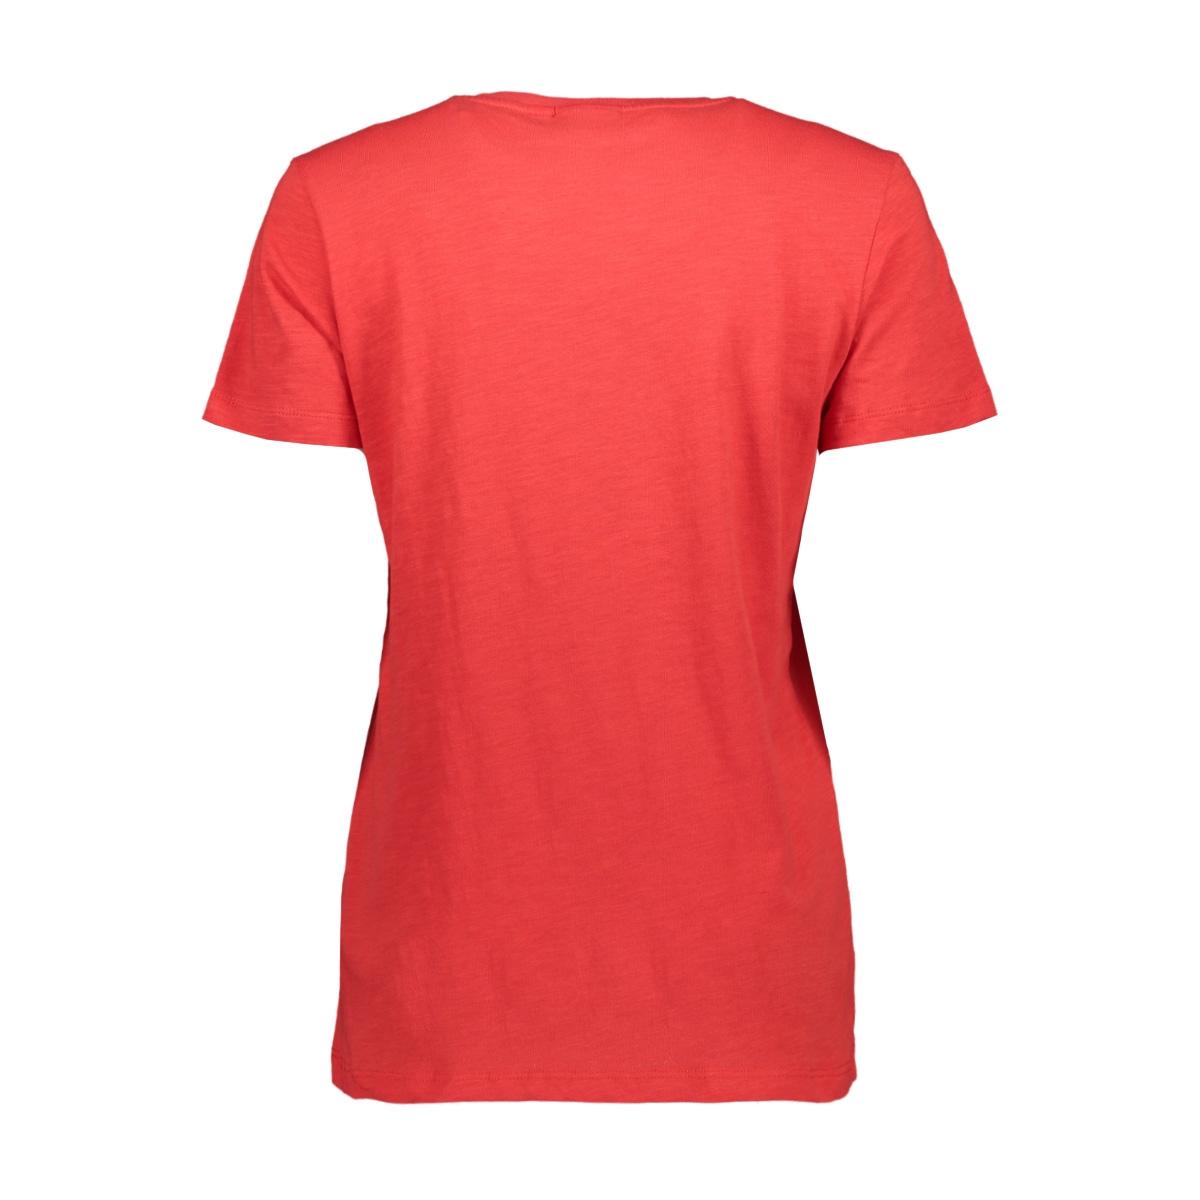 t shirt w flock print t1547 saint tropez t-shirt 7360